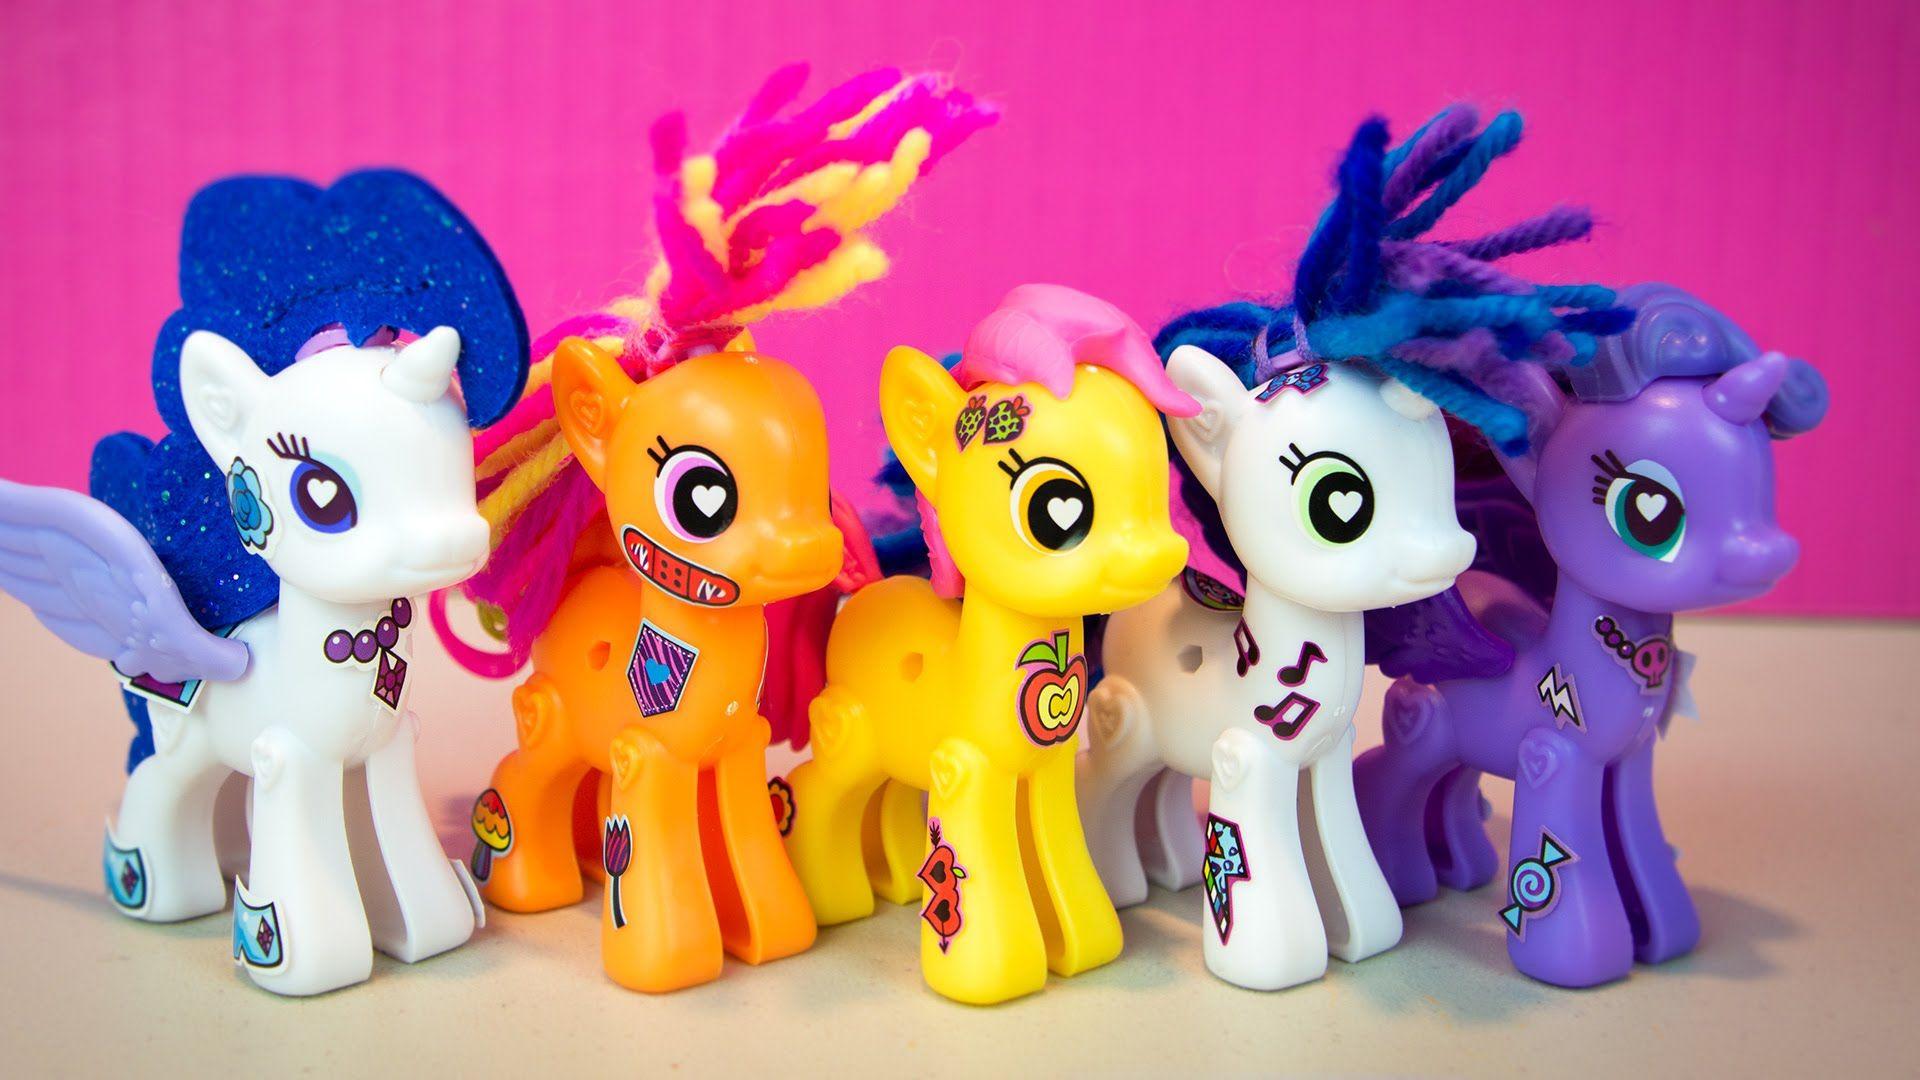 Cutie Crusaders My Little Pony Playset